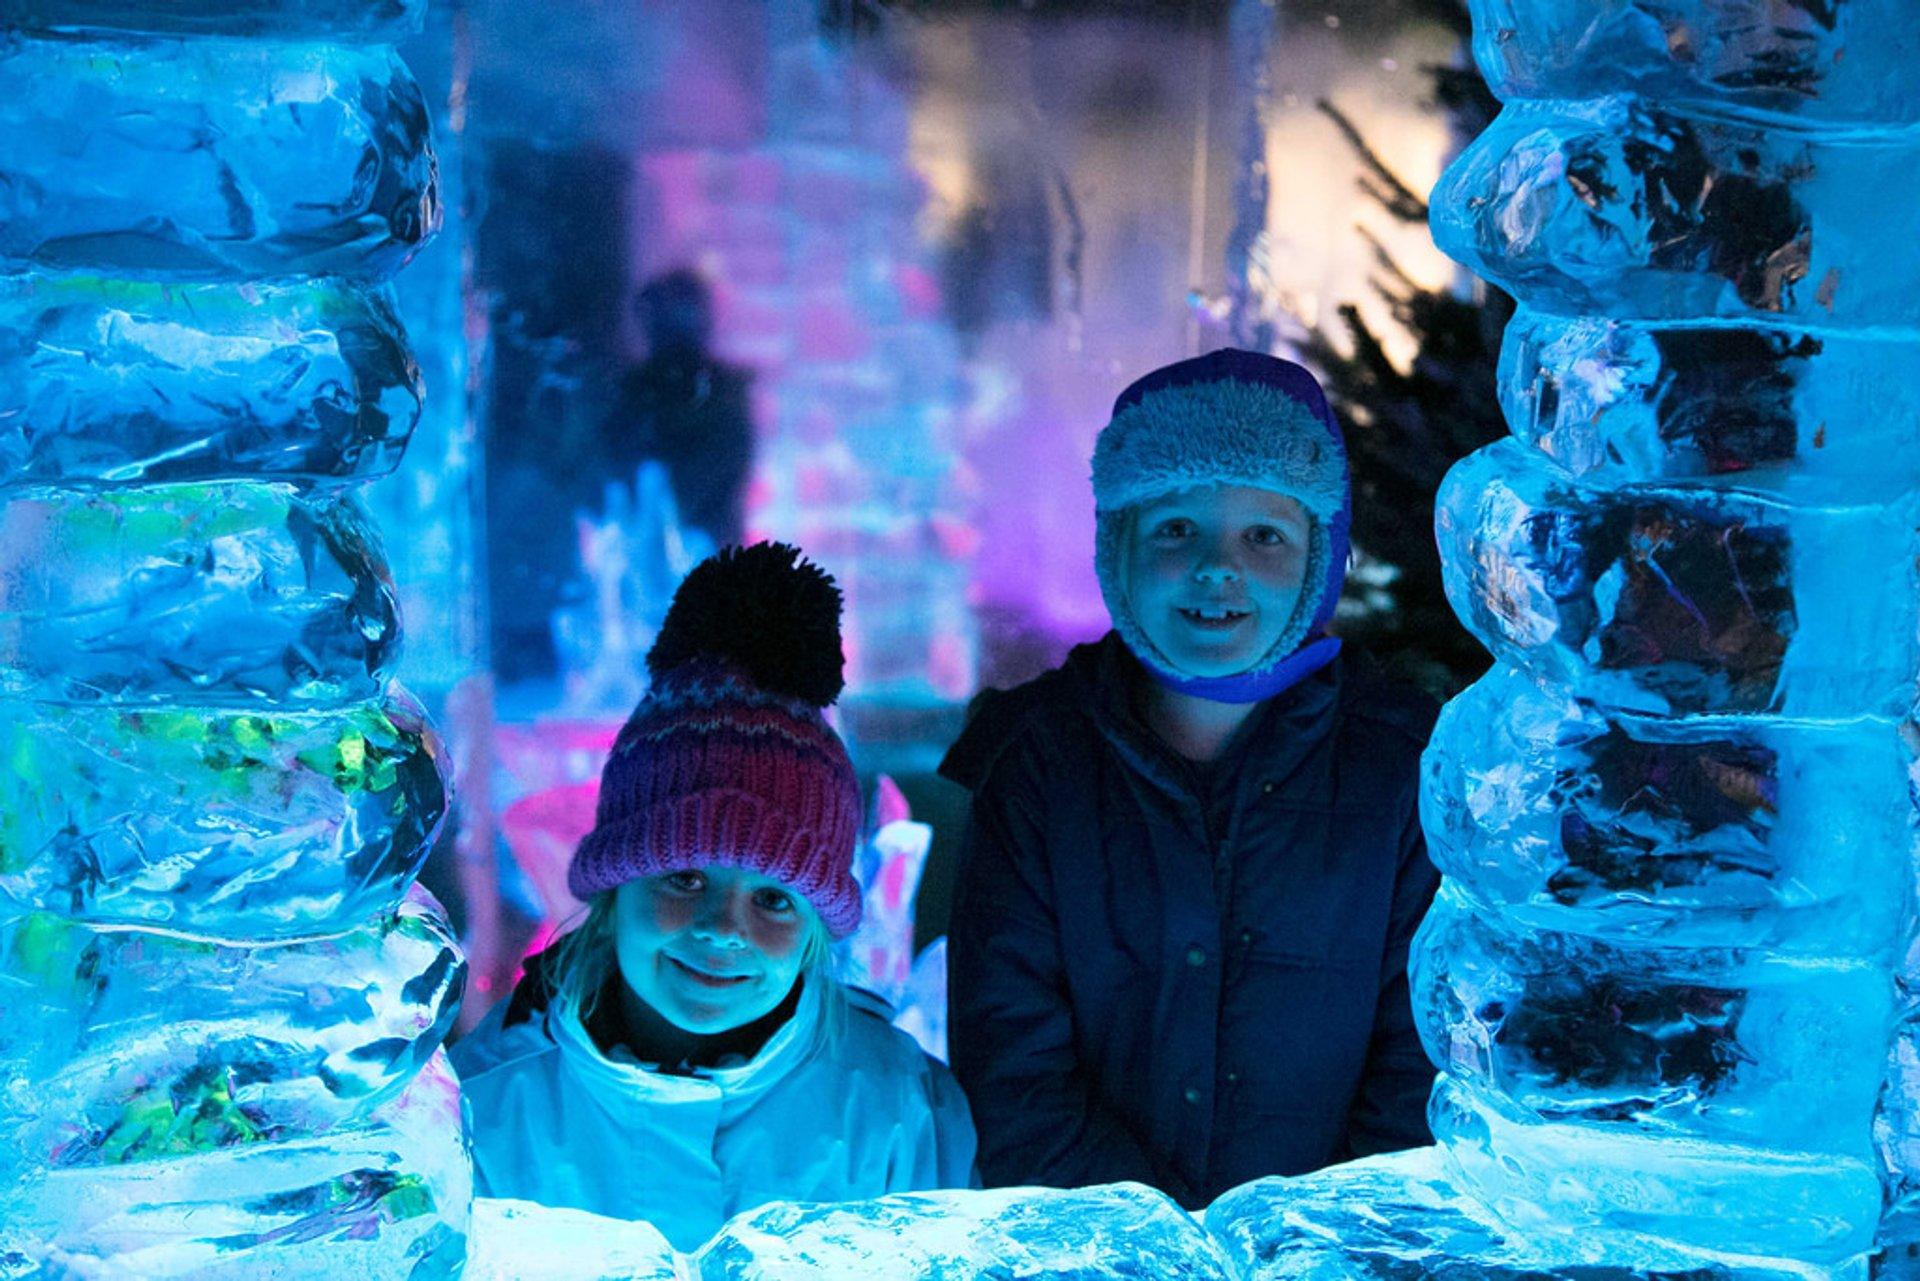 Liverpool Christmas Ice Festival in Liverpool - Best Season 2020